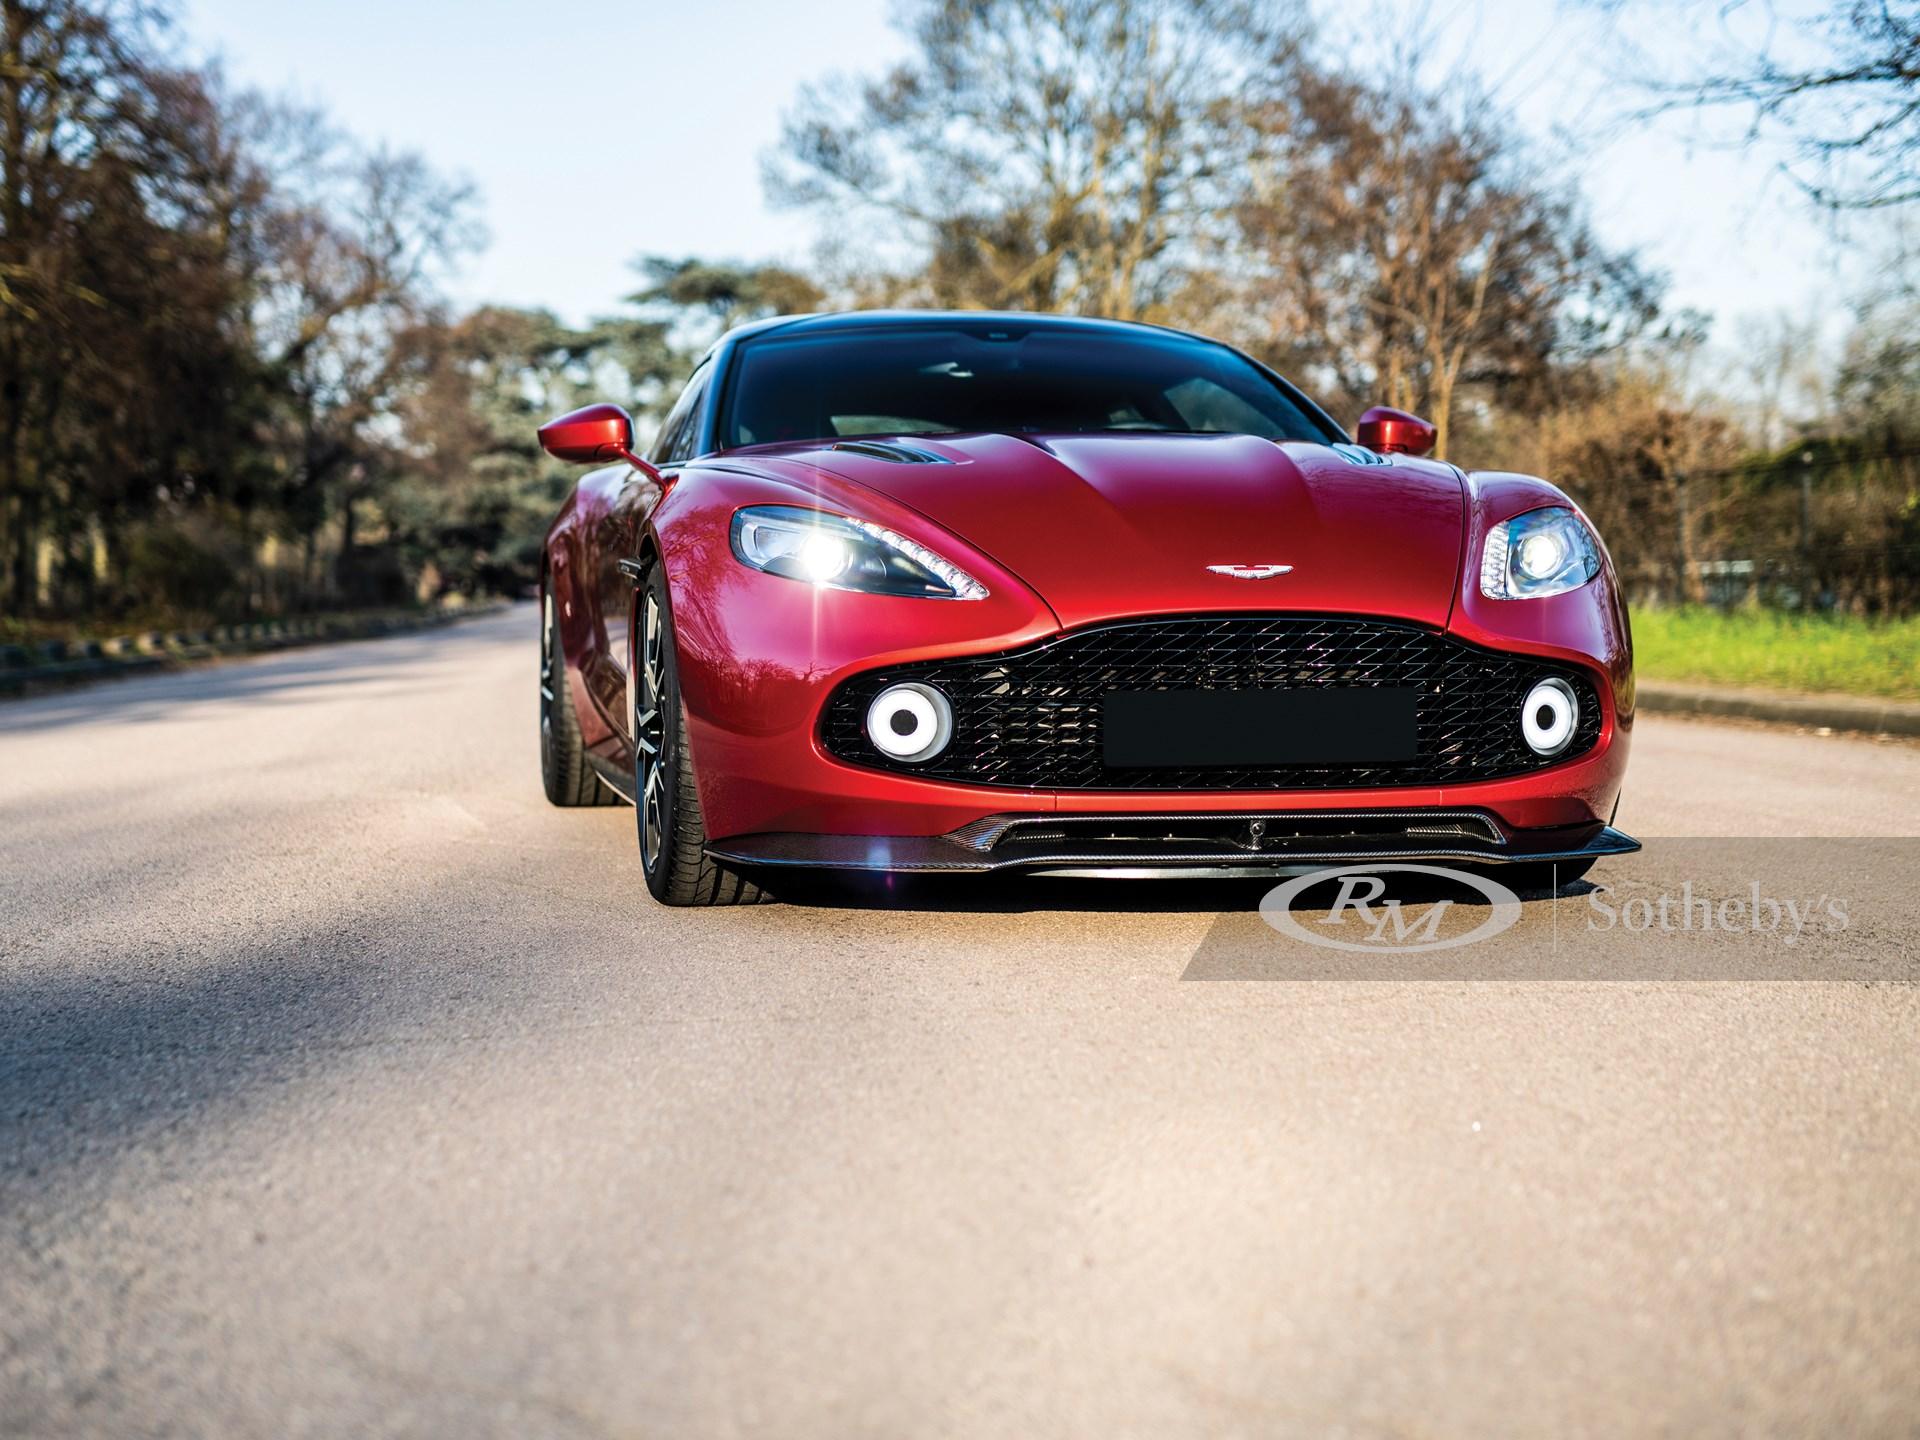 2019 Aston Martin Vanquish Zagato Shooting Brake  -